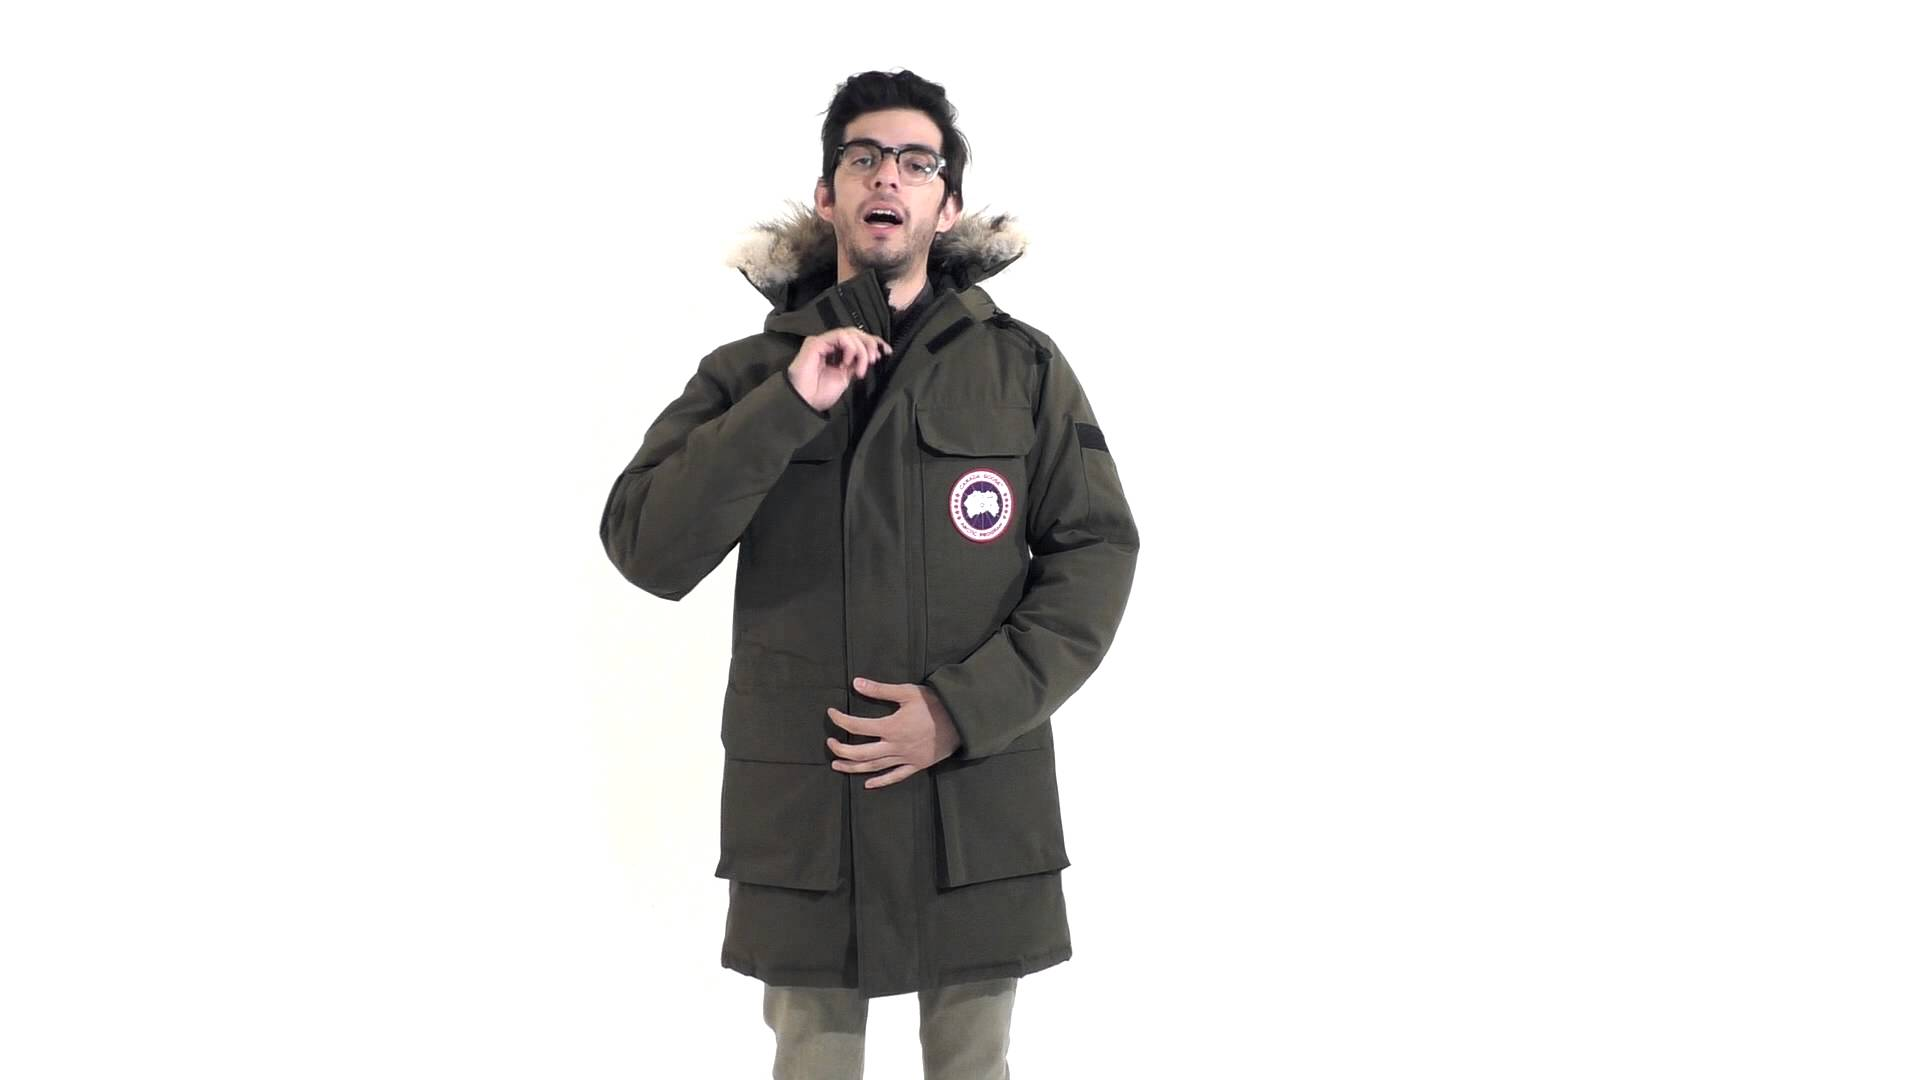 Mountaineer Jacket Canada Goose | Canada Goose Citadel | Canada Goose Bubble Coat